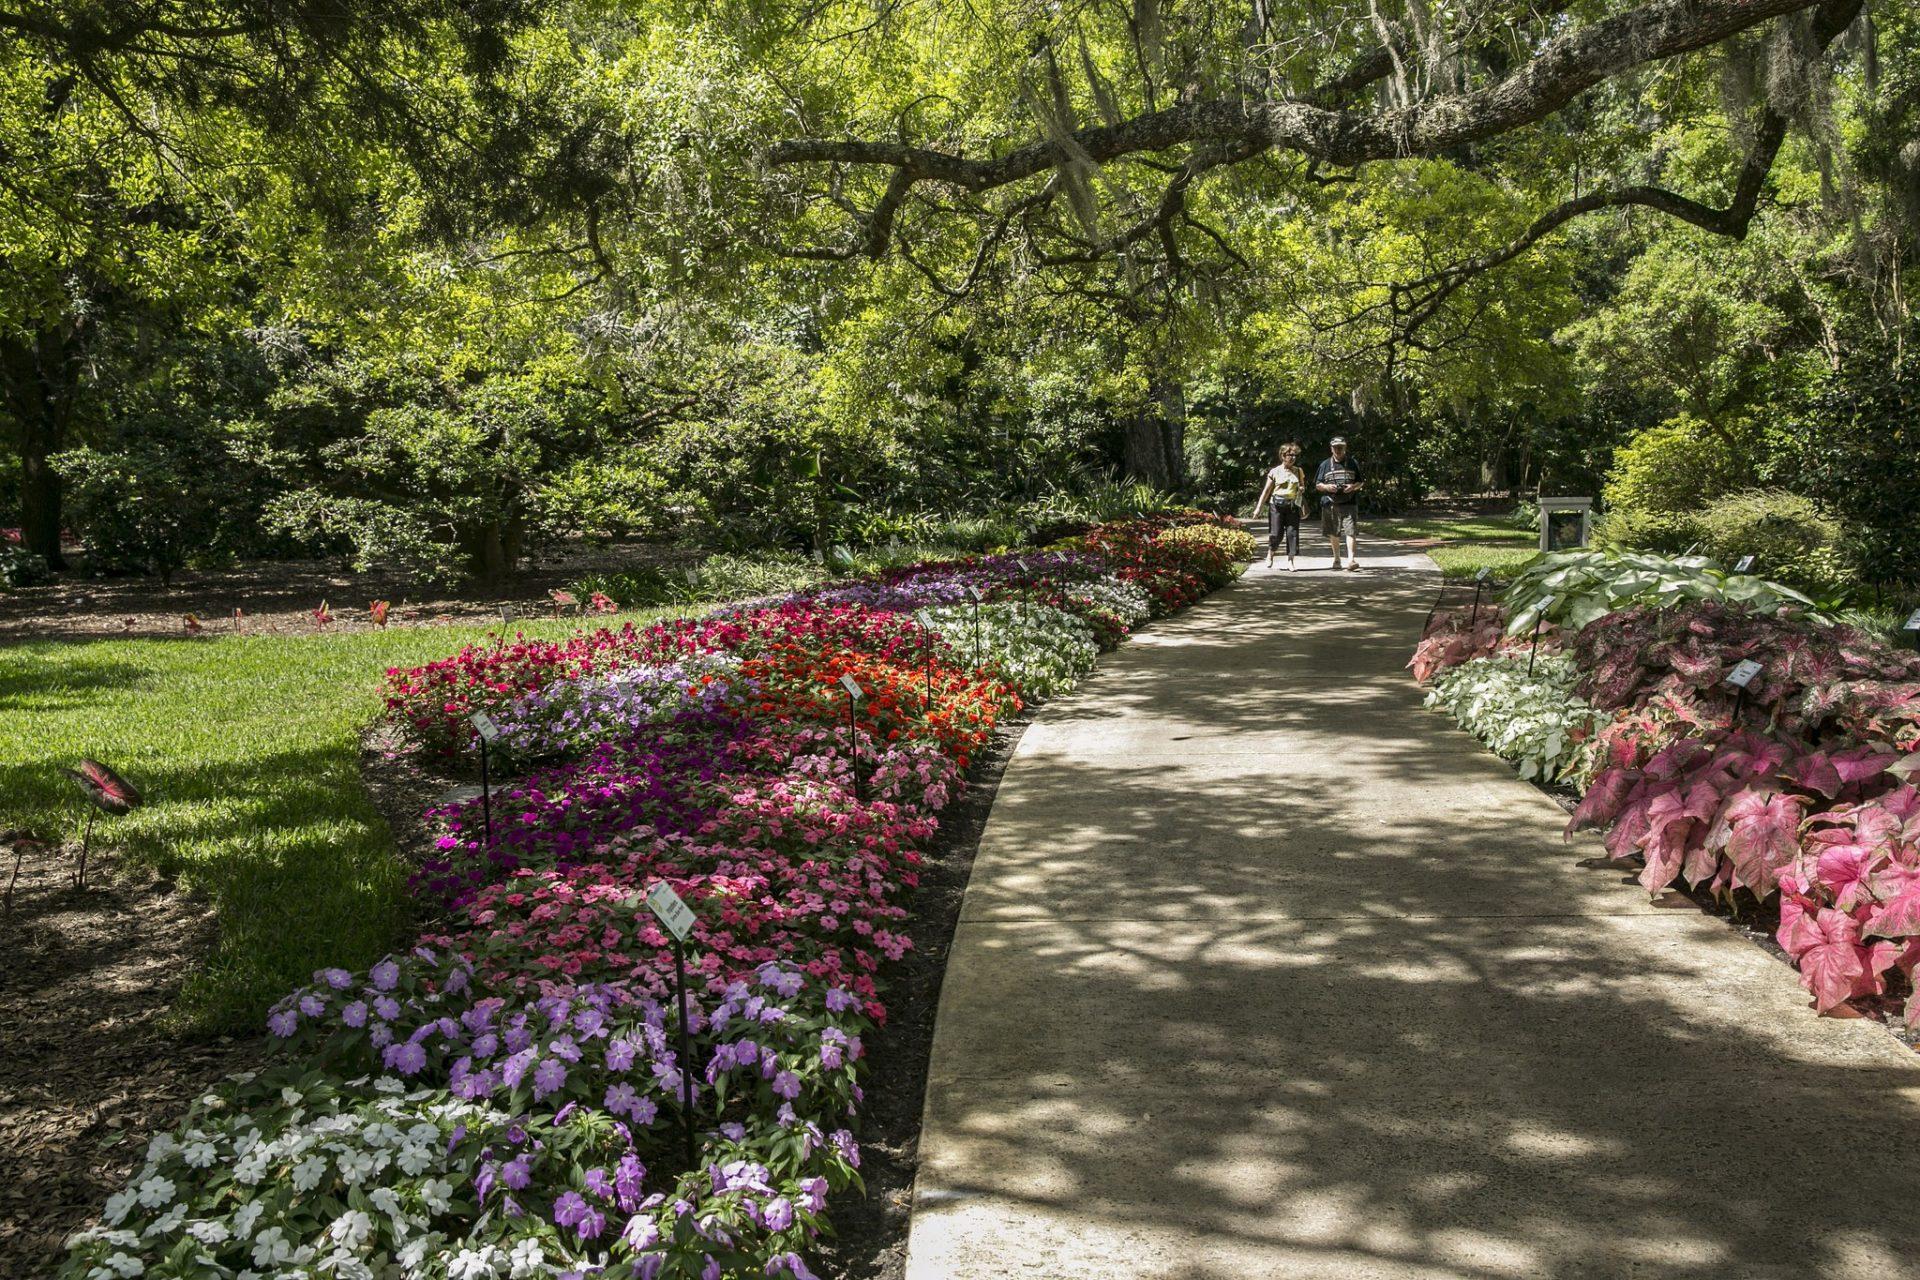 What to do in Orlando: Harry P. Leu Gardens. Photo by Visit Florida Editor via Flickr CC